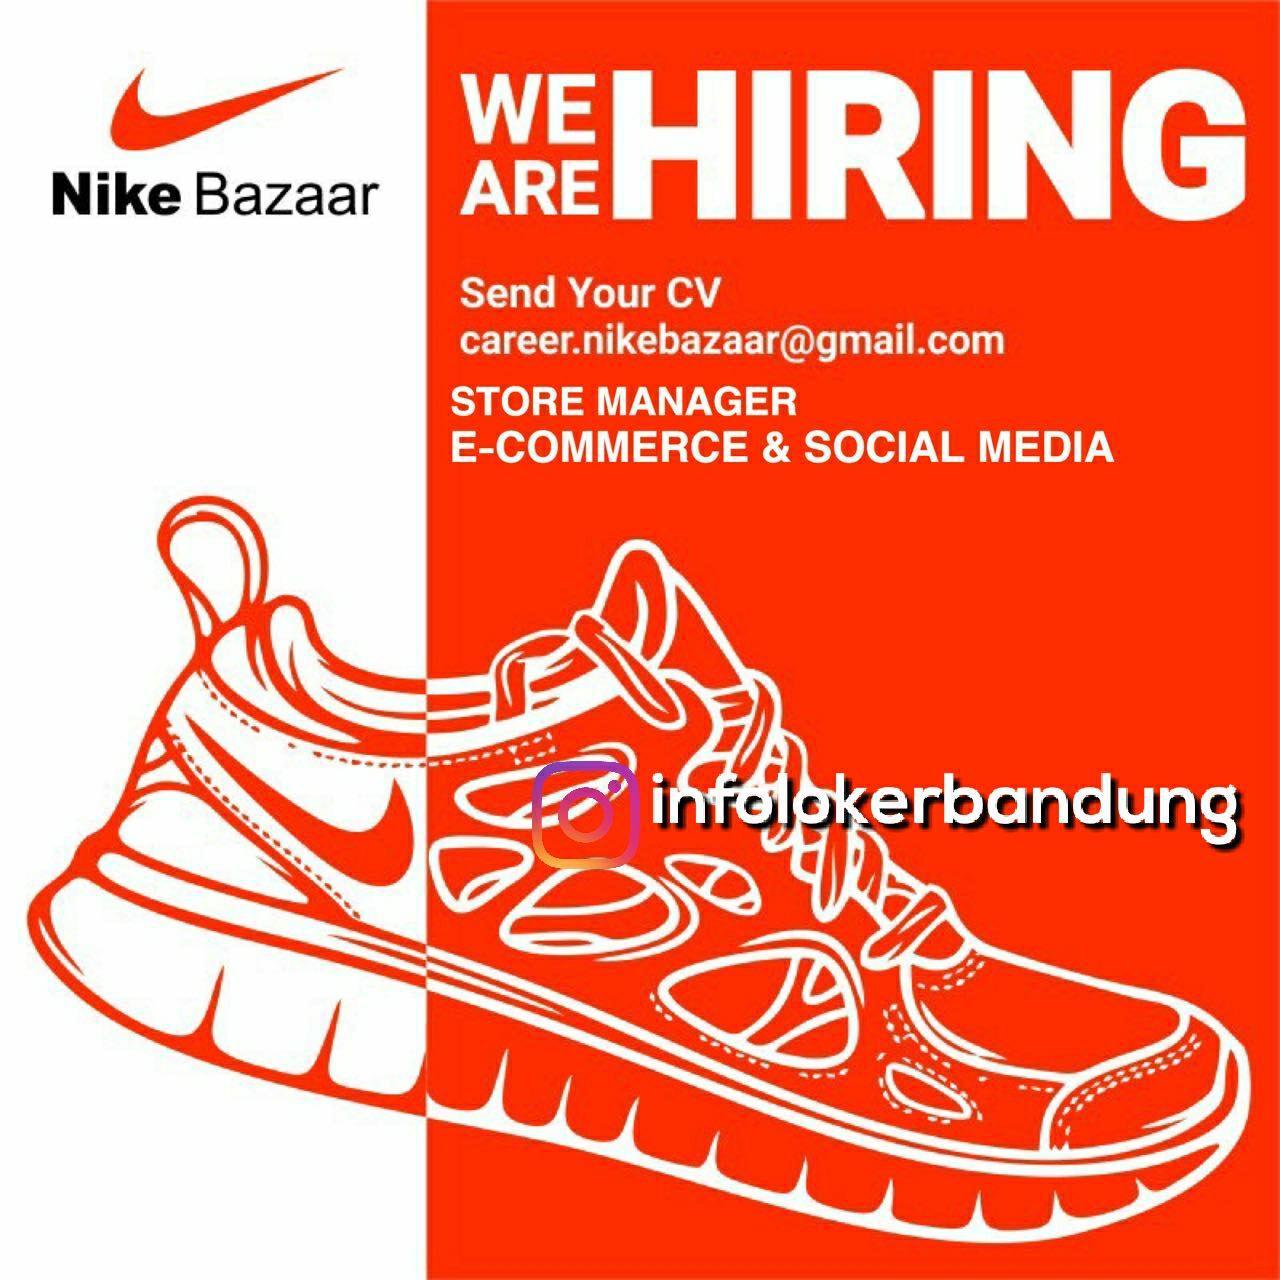 Lowongan Kerja Nike Bazaar Bandung Desember 2017